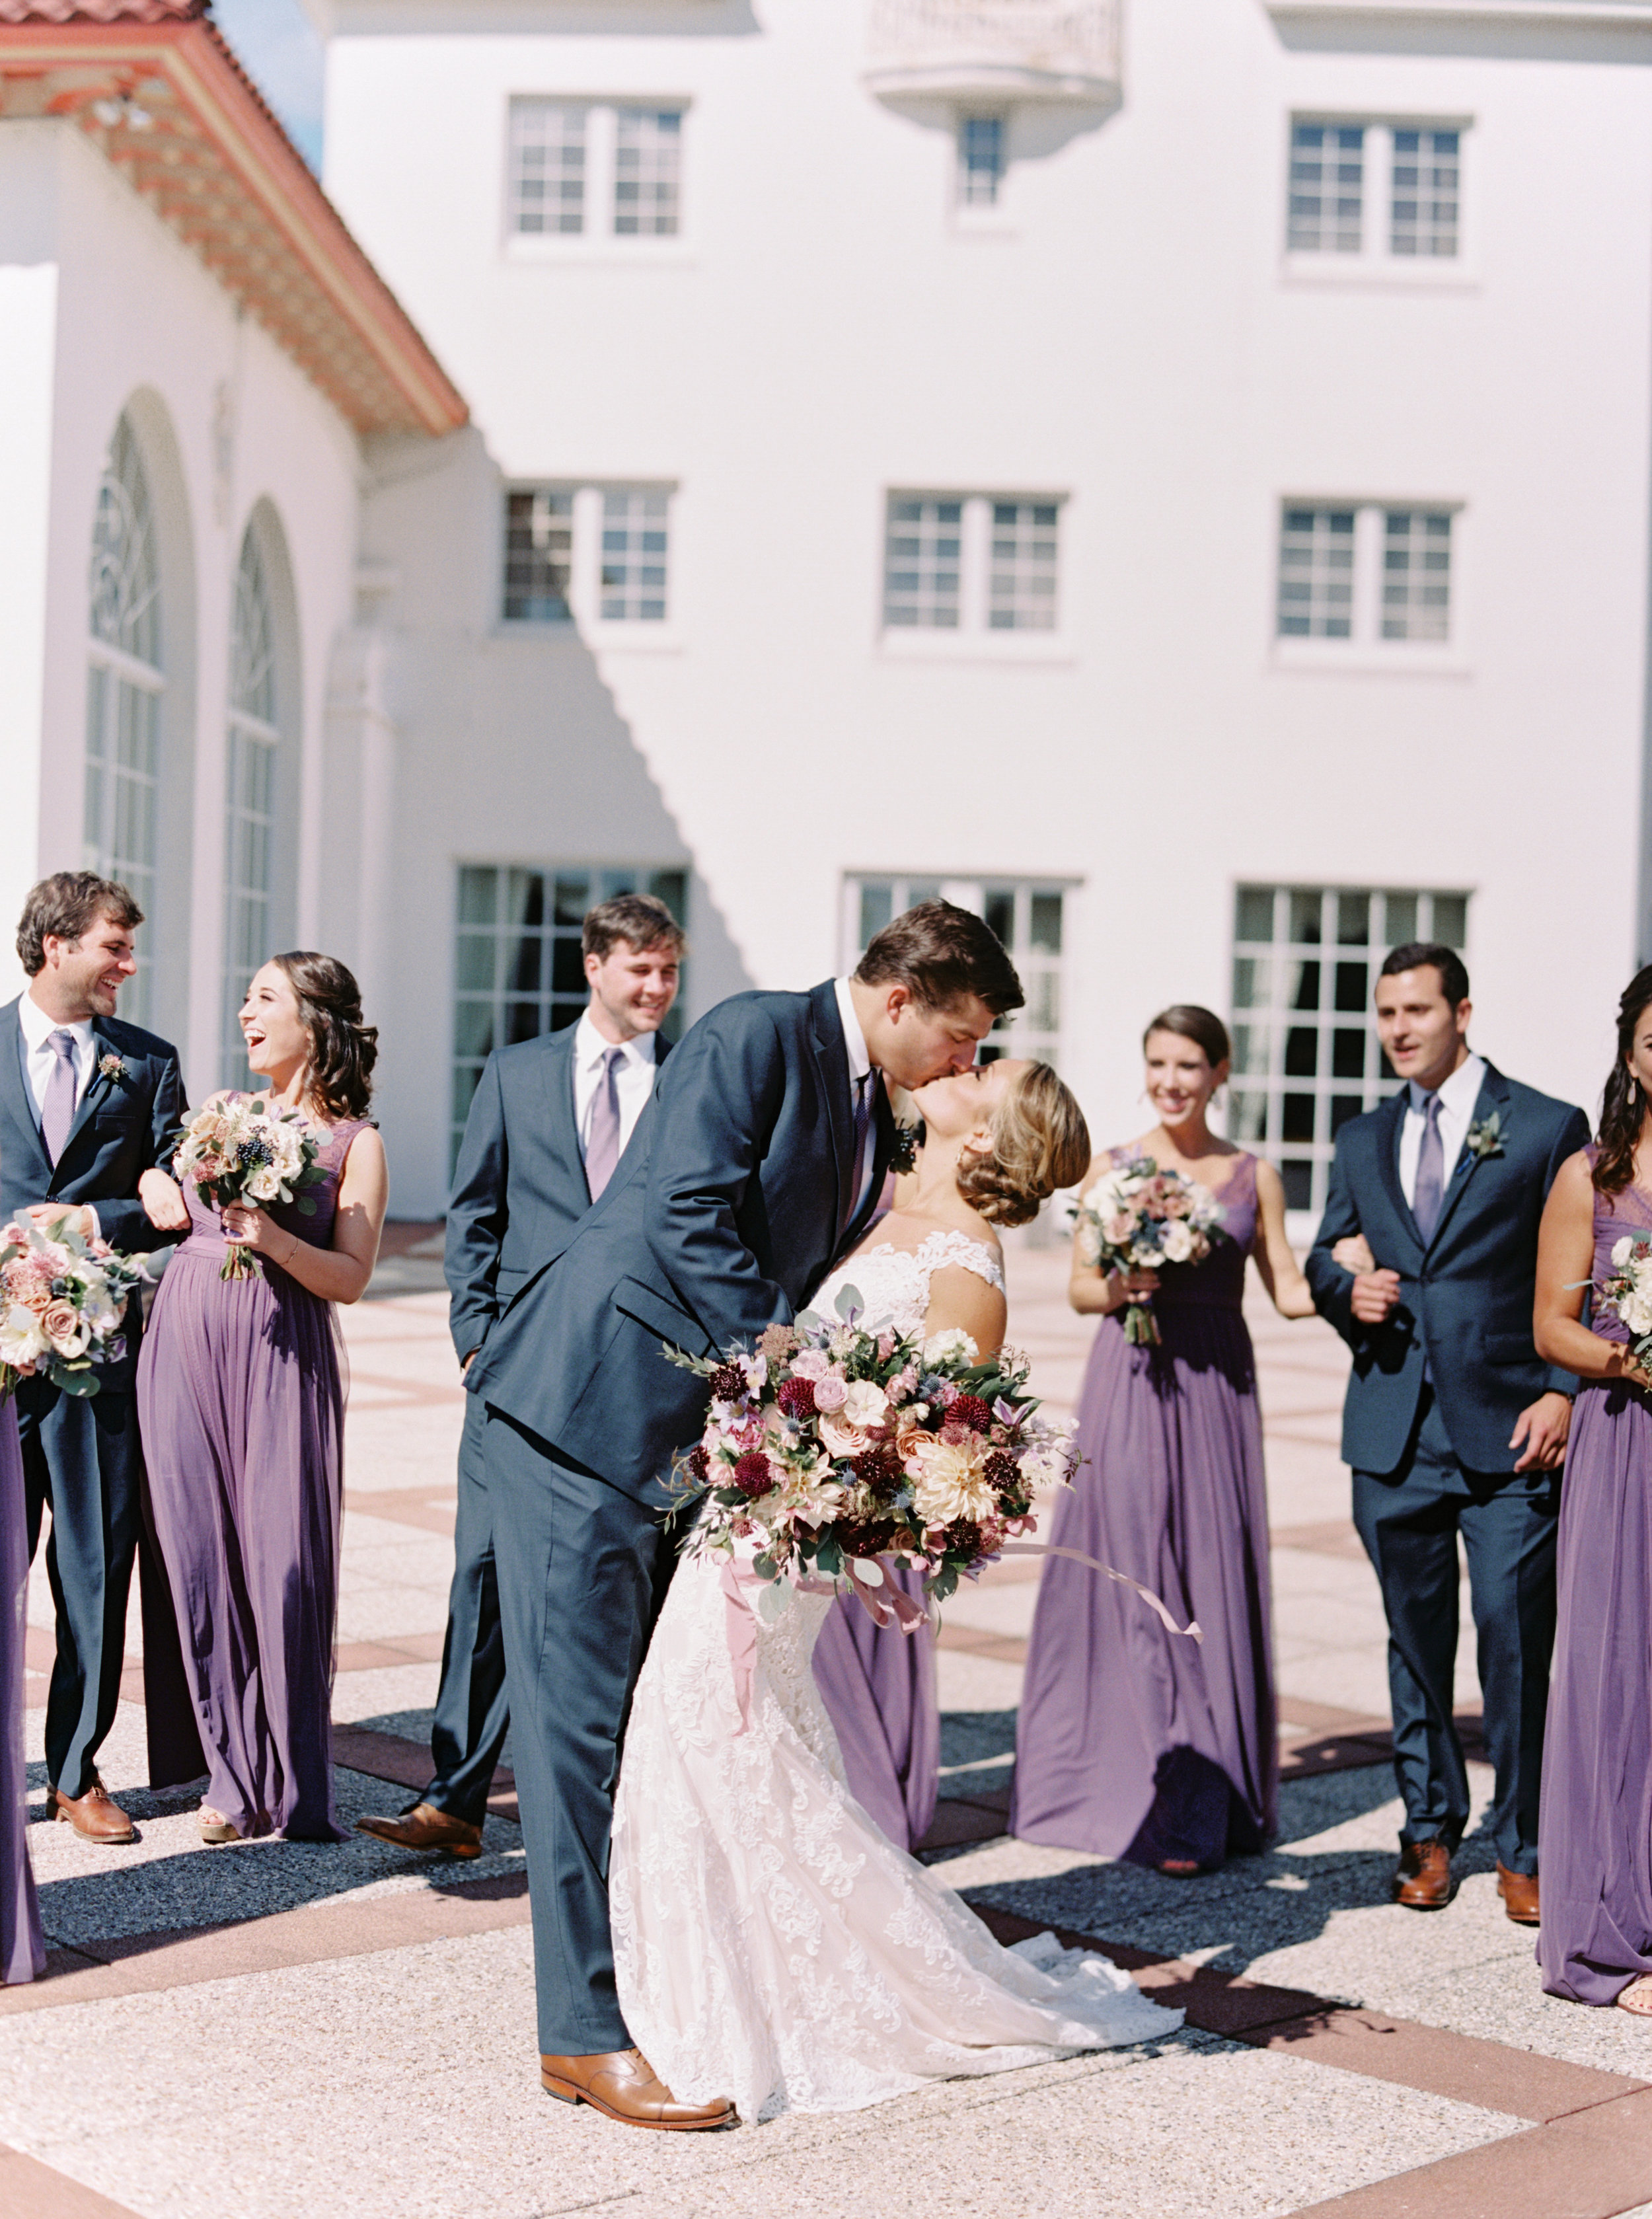 Congressional-Country-Club-wedding-Bathesda-Maryland-wedding-photographer-Richmond-natalie-jayne-photography-image-08-2.jpg